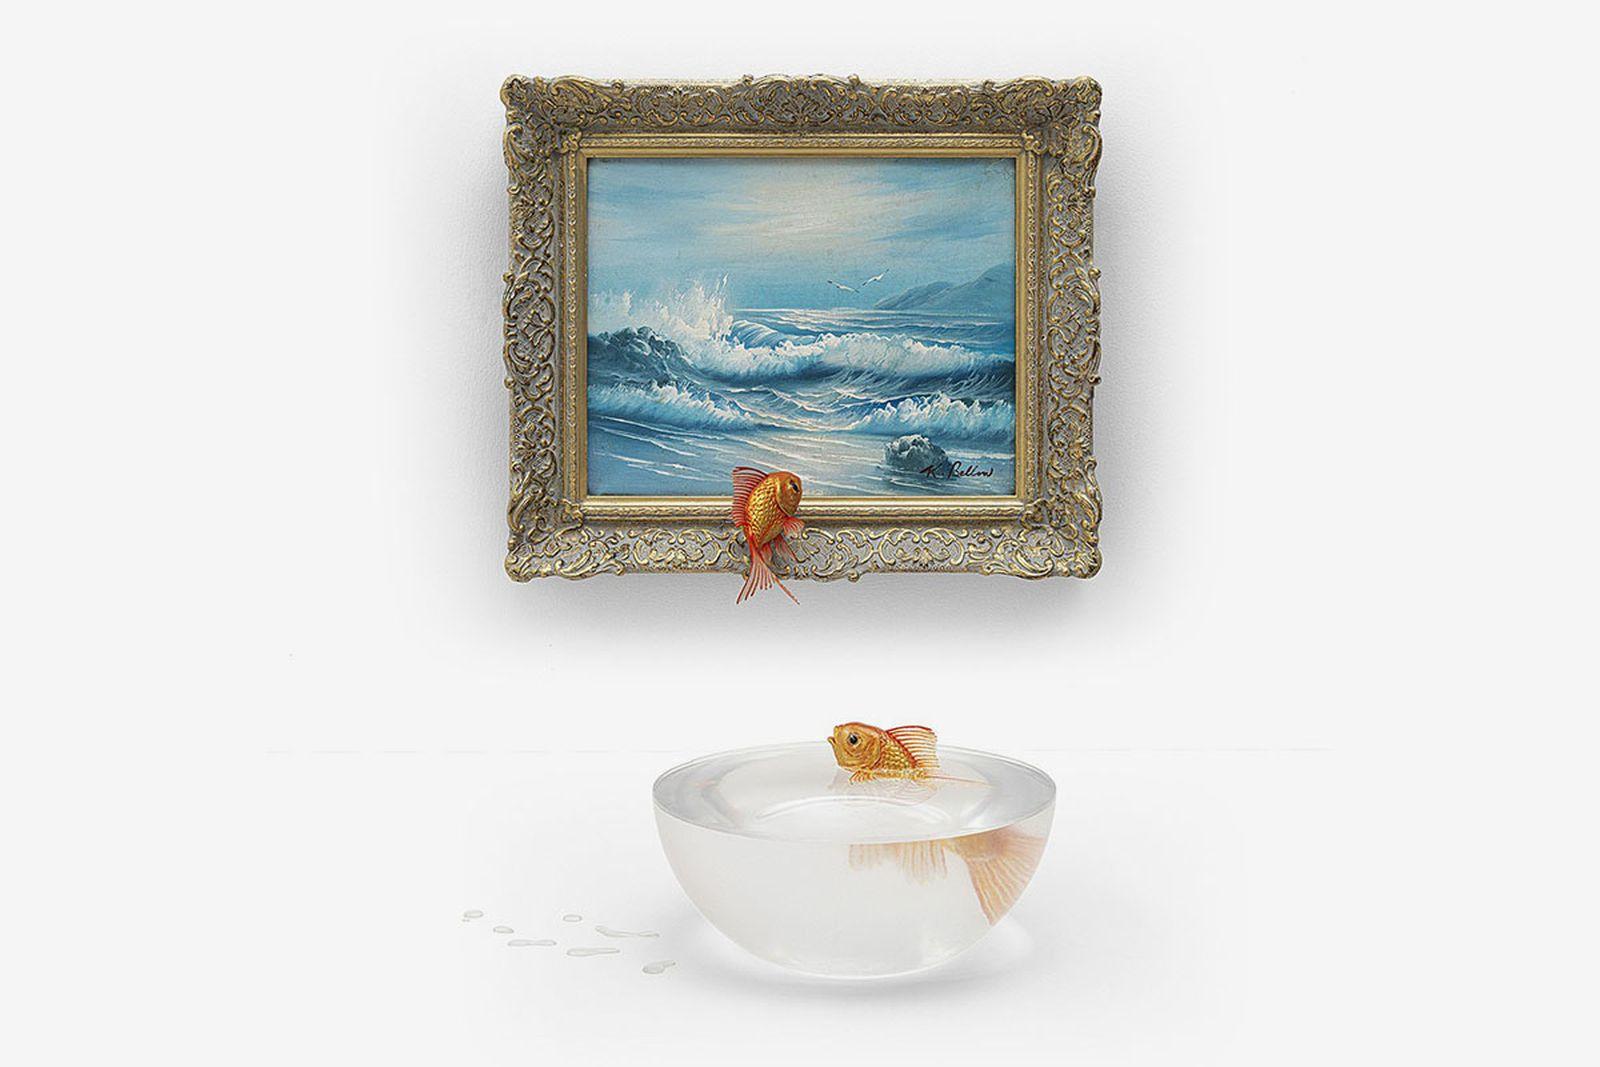 Banksy Gross Domestic Product goldfish